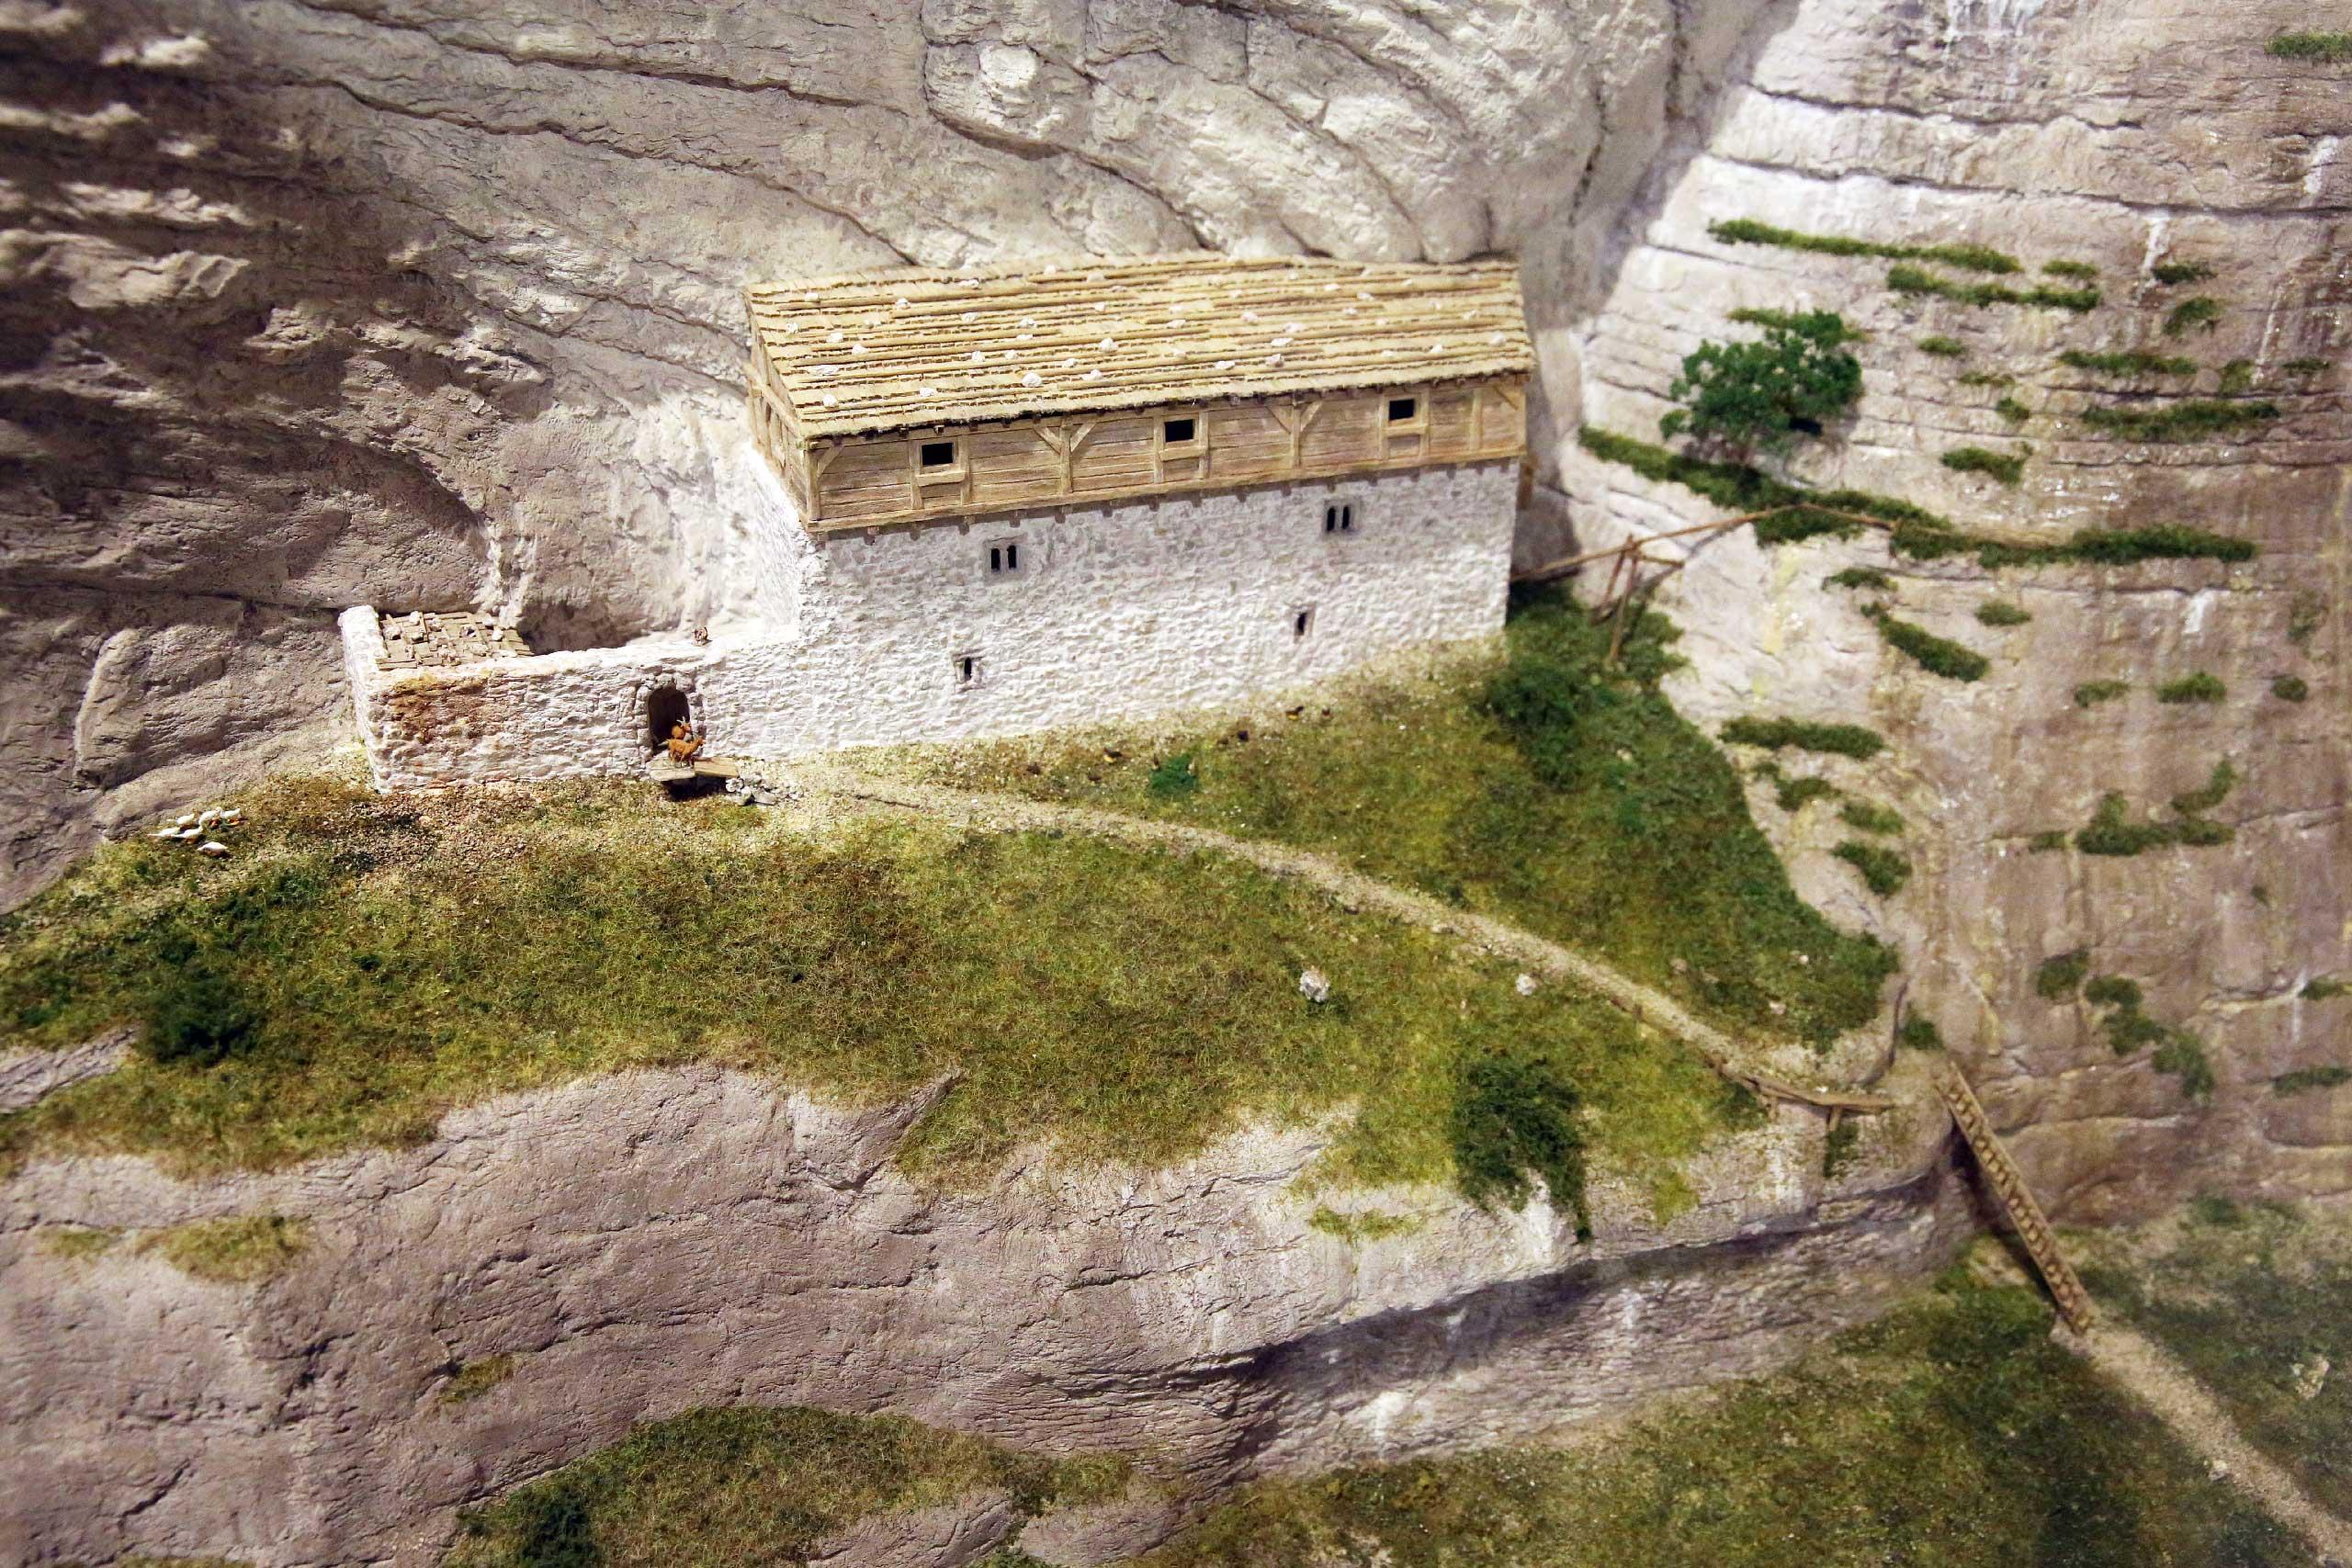 dorfmuseum-wilderwil-modell-ruine-rotenfluh